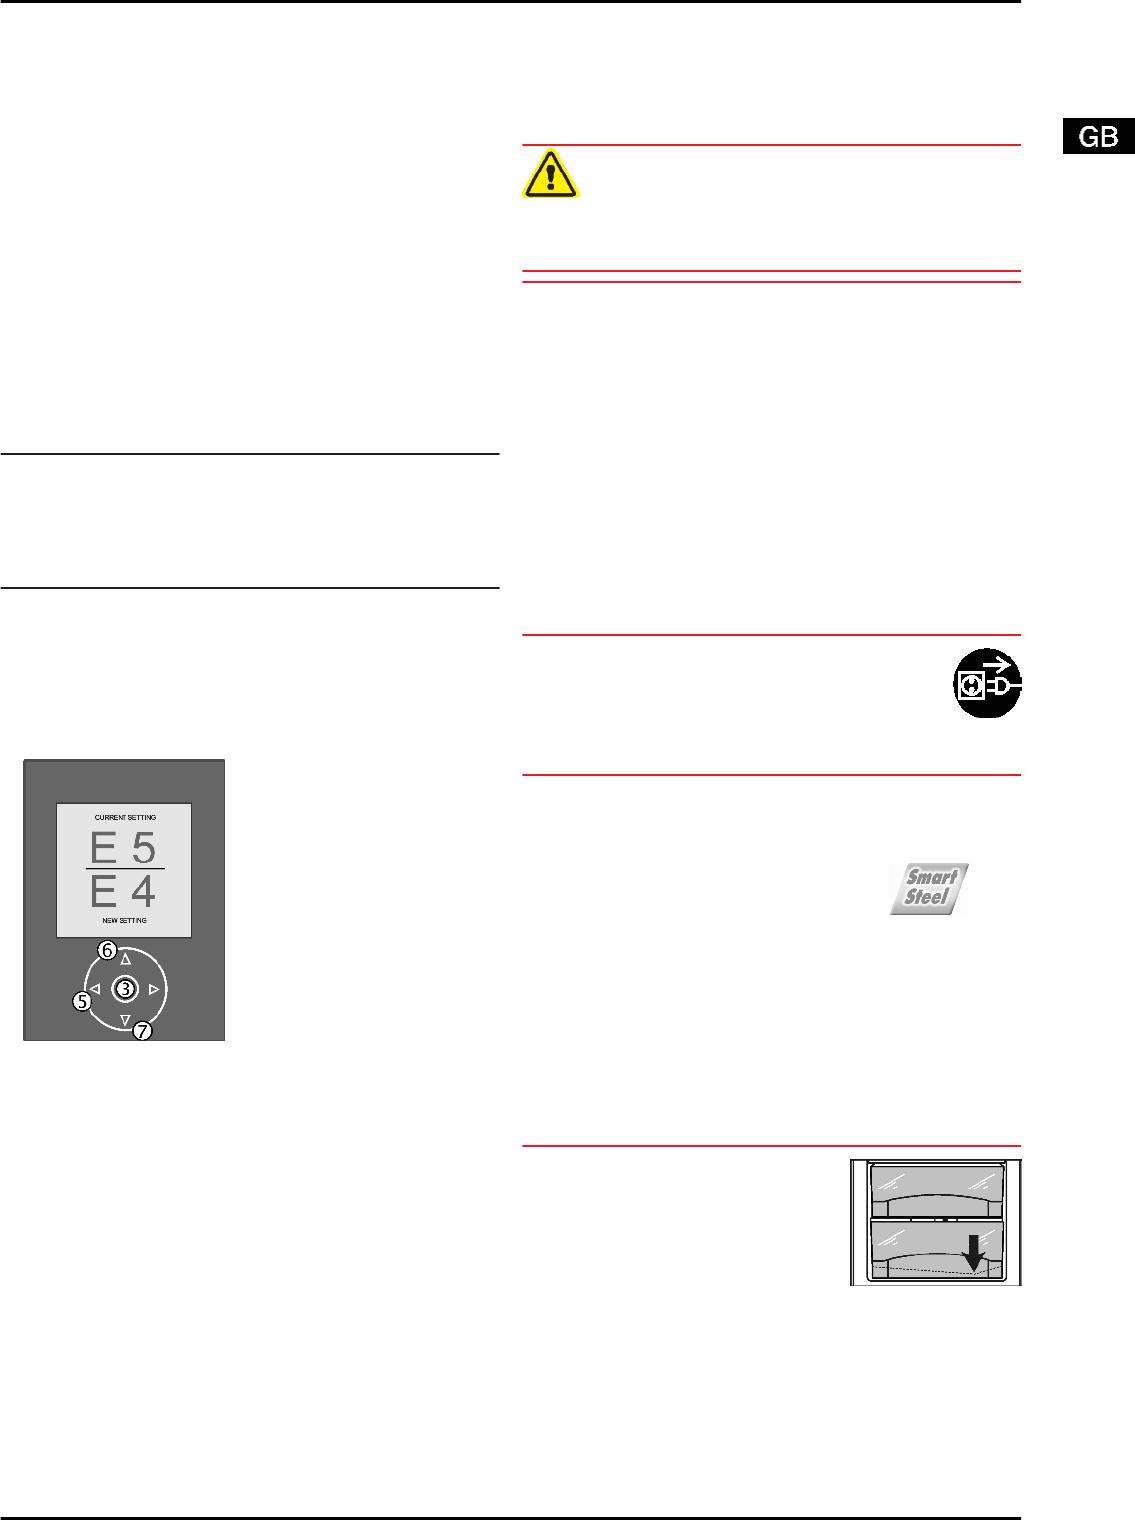 Handleiding Liebherr CBNPes 3967 PremiumPlus (pagina 21 van 26